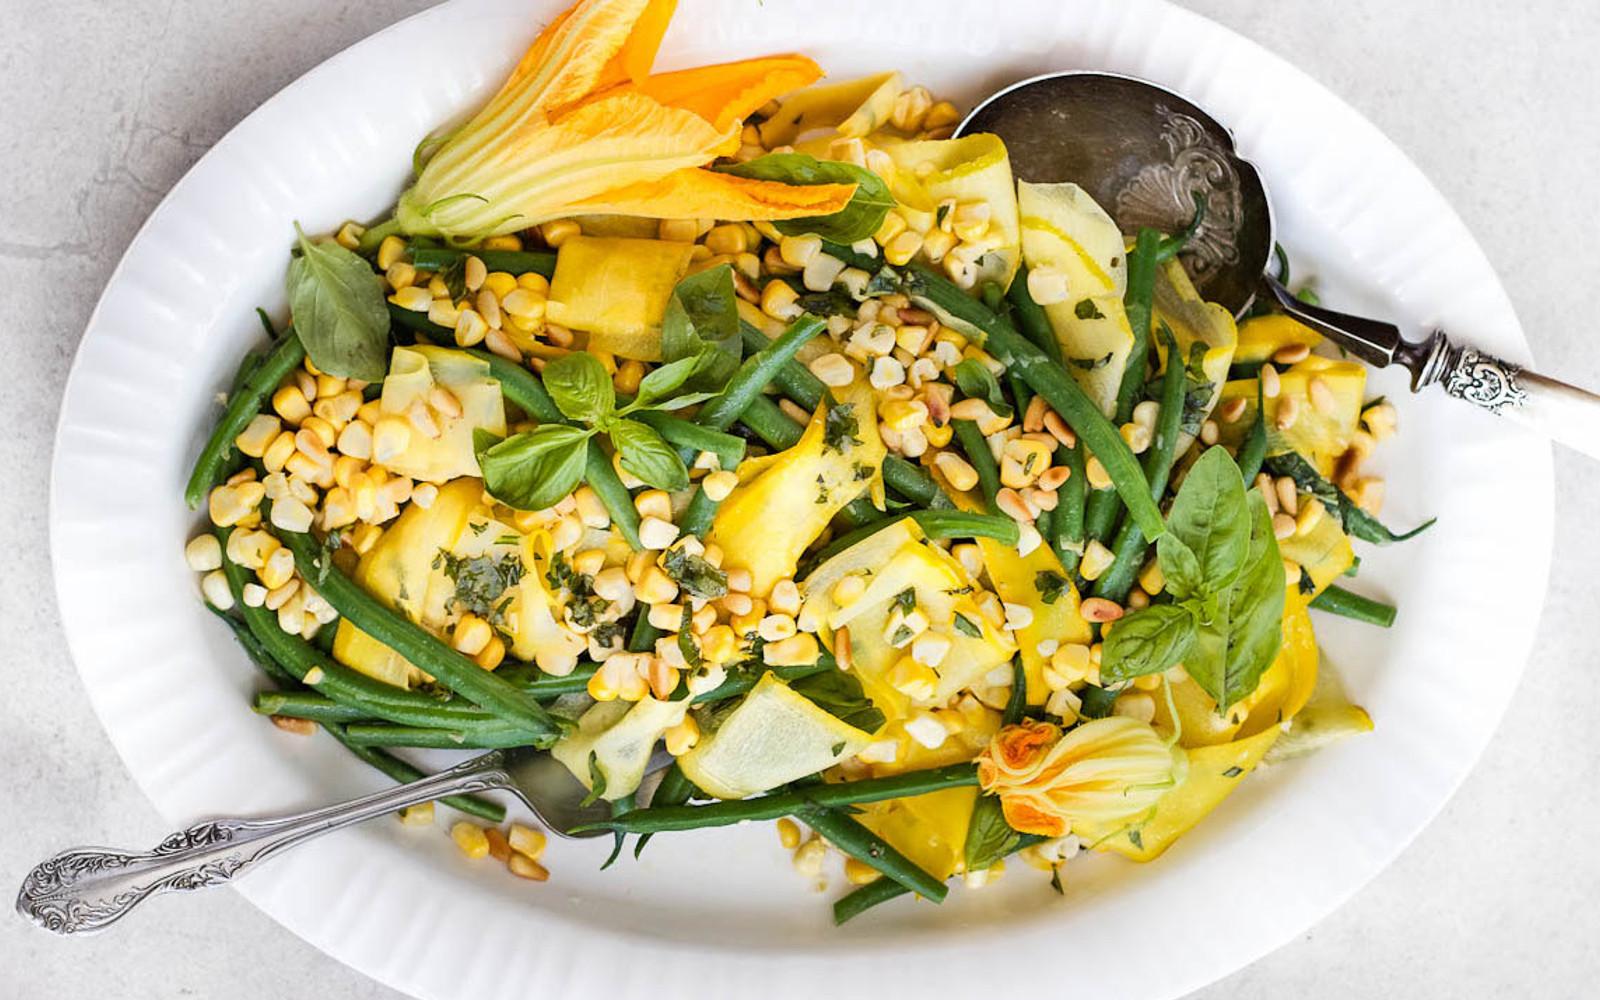 Green Bean, Corn, and Squash Salad With Basil Dressing